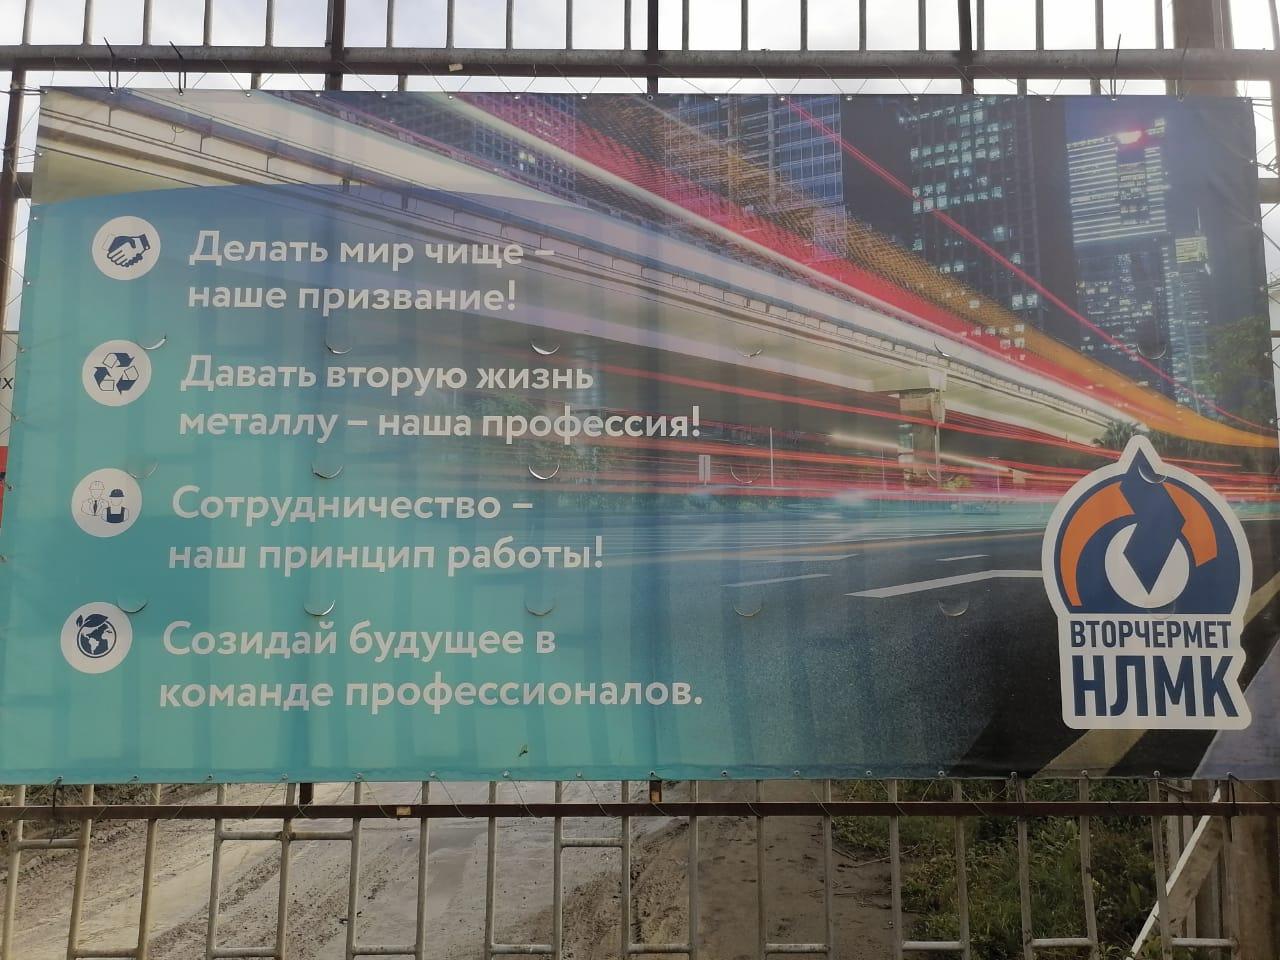 ООО Вторчермет НЛМК Сибирь